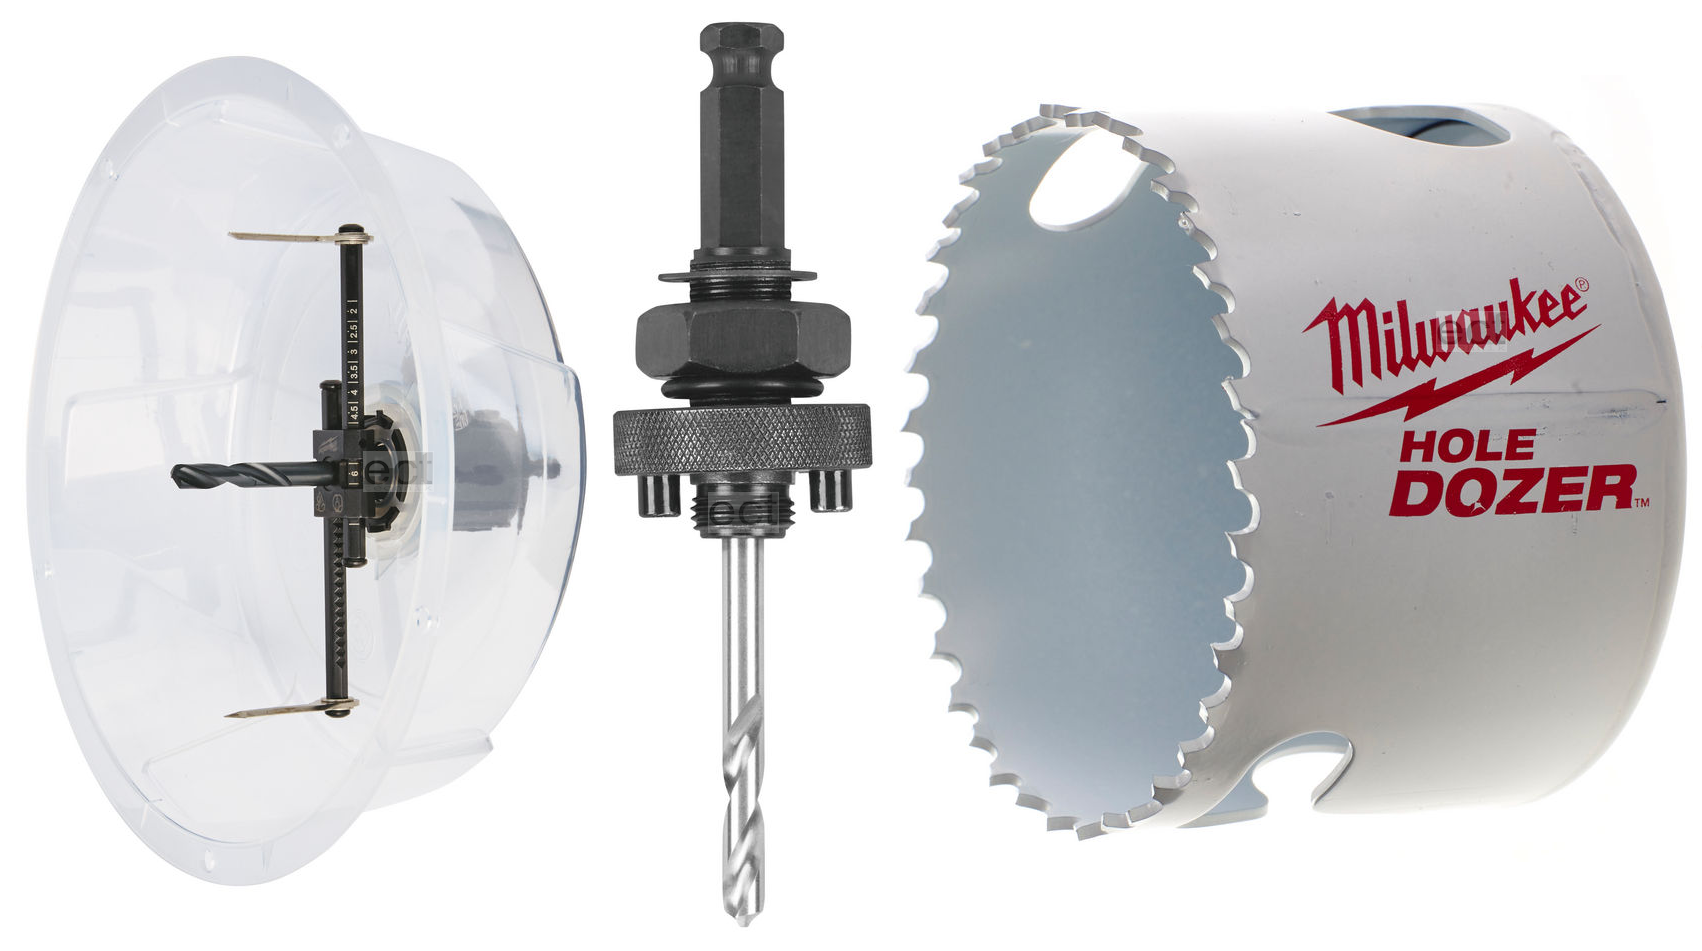 Otwornica nastawna 1-178 mm + uchwyt + otwornica BI 68 mm MILWAUKEE (nr kat. 4932478930)